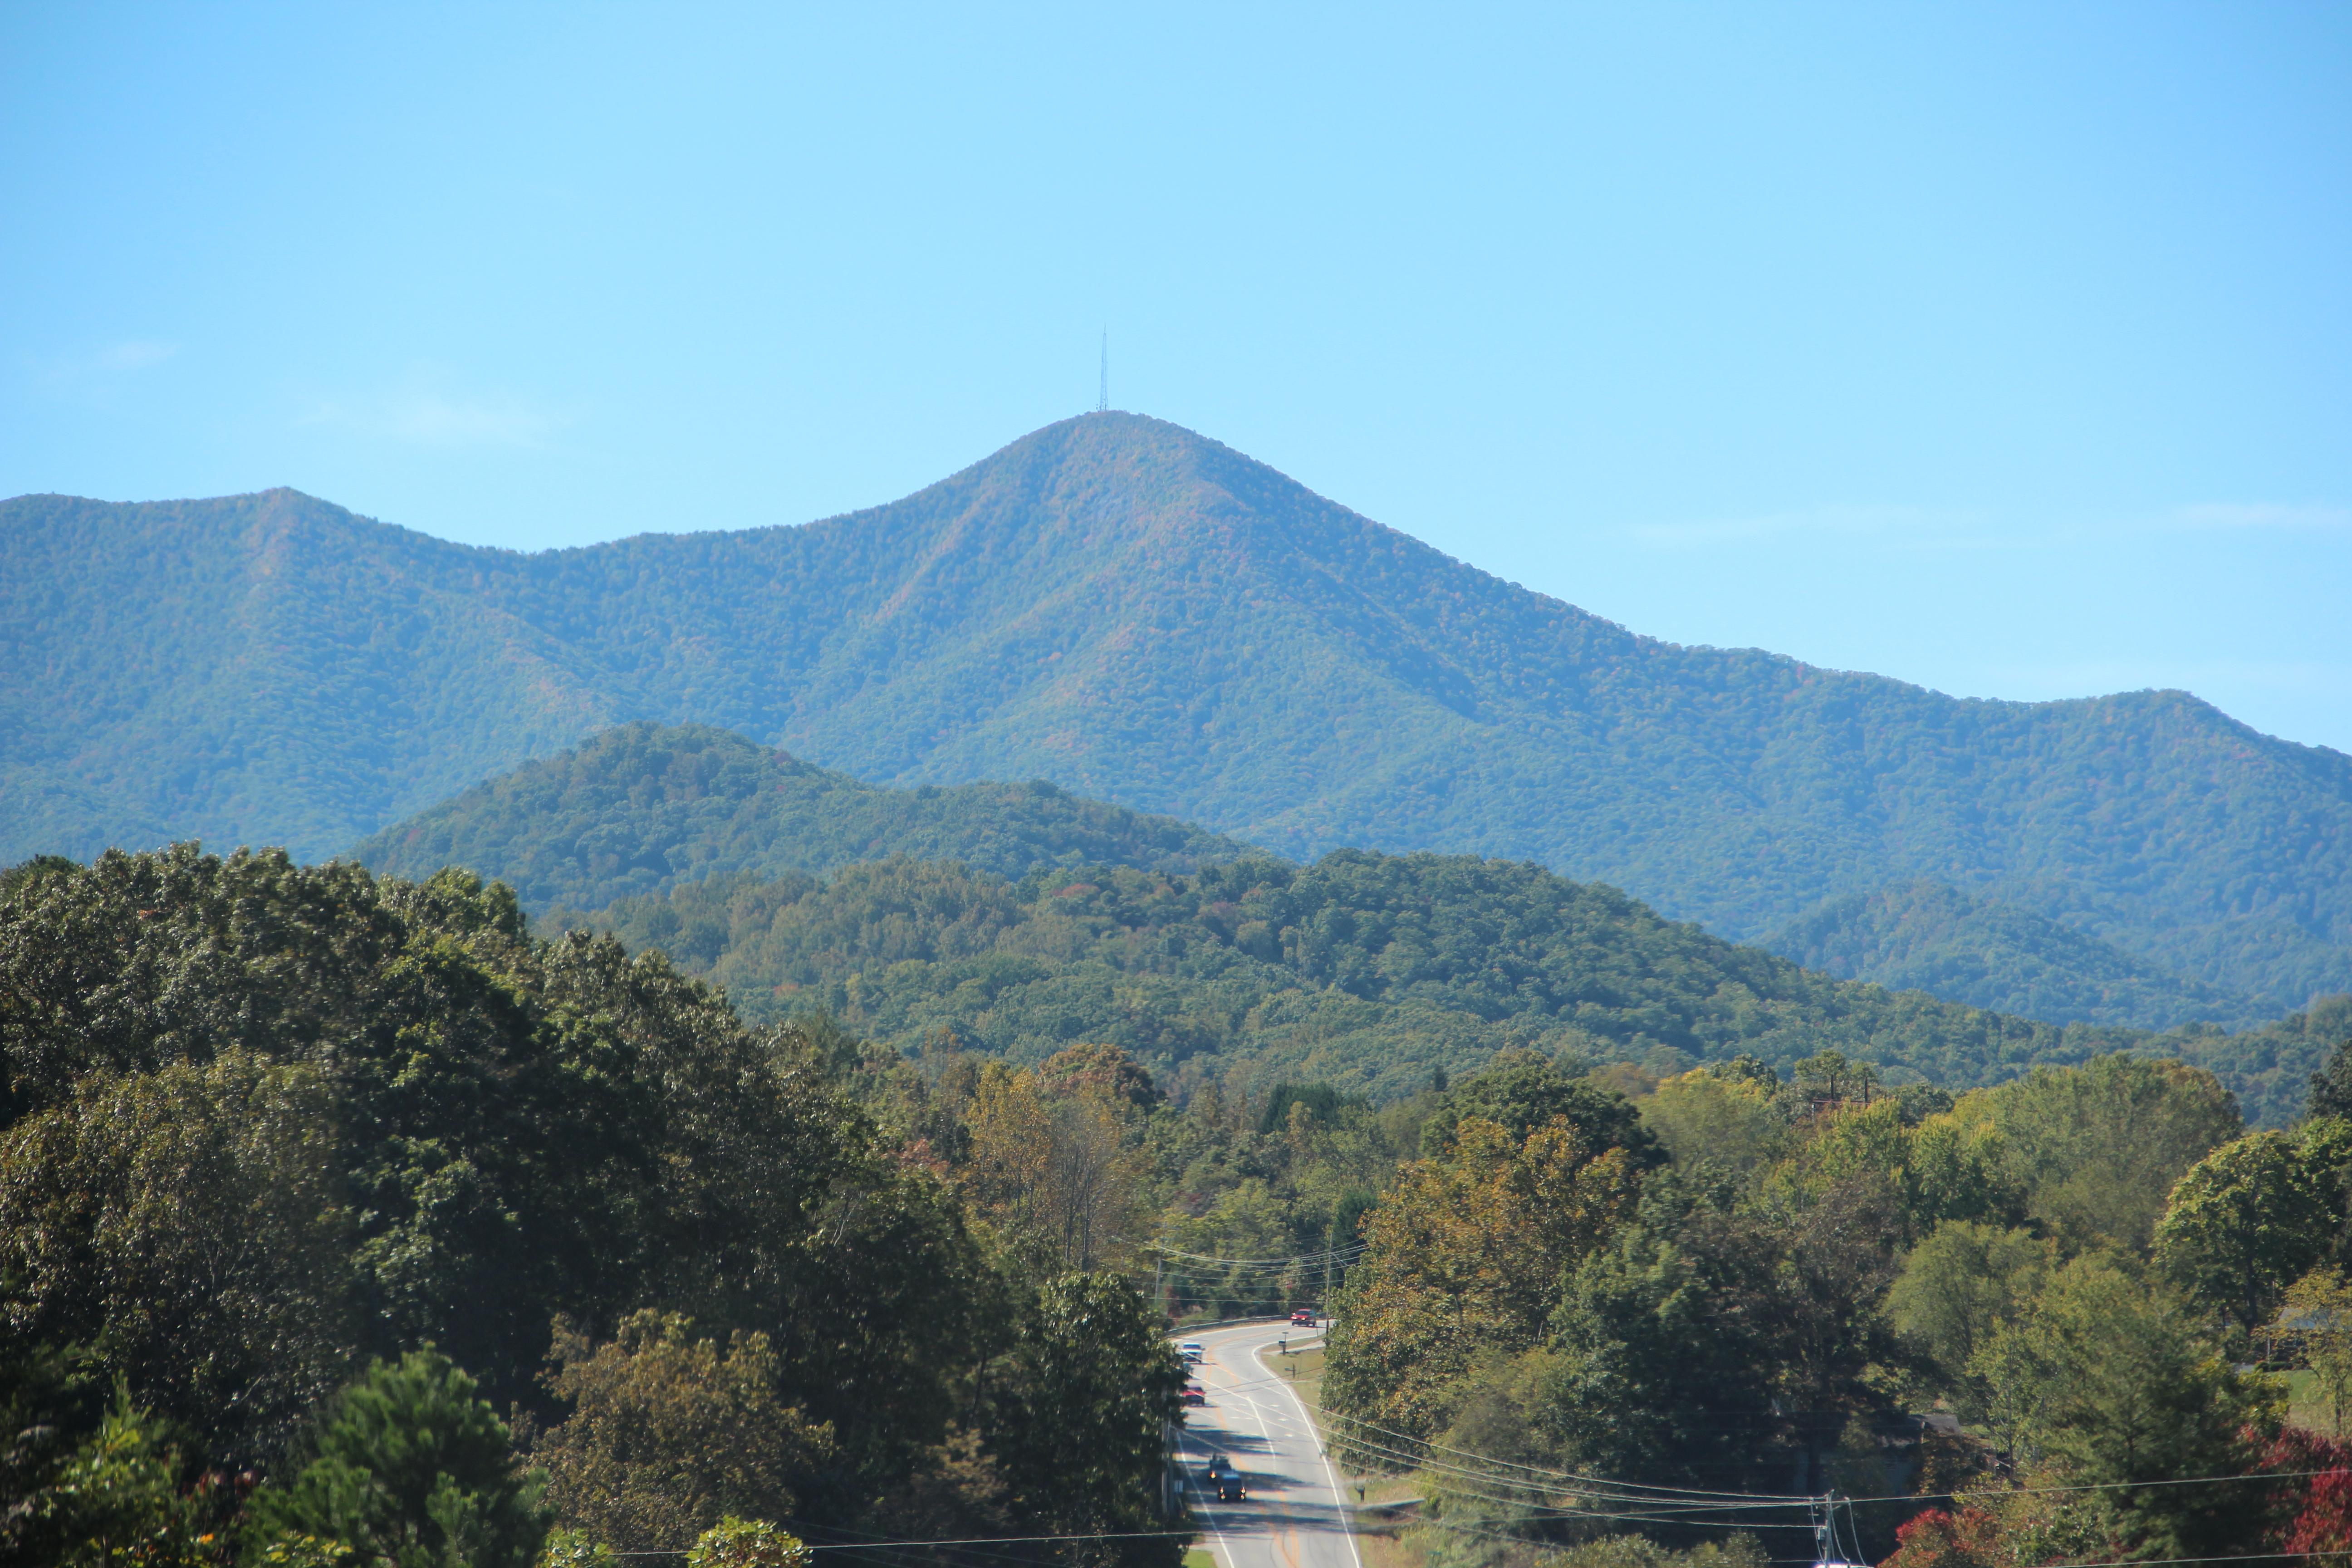 File:Mount Pisgah from NC 151, Oct 2016 1.jpg - Wikimedia ...